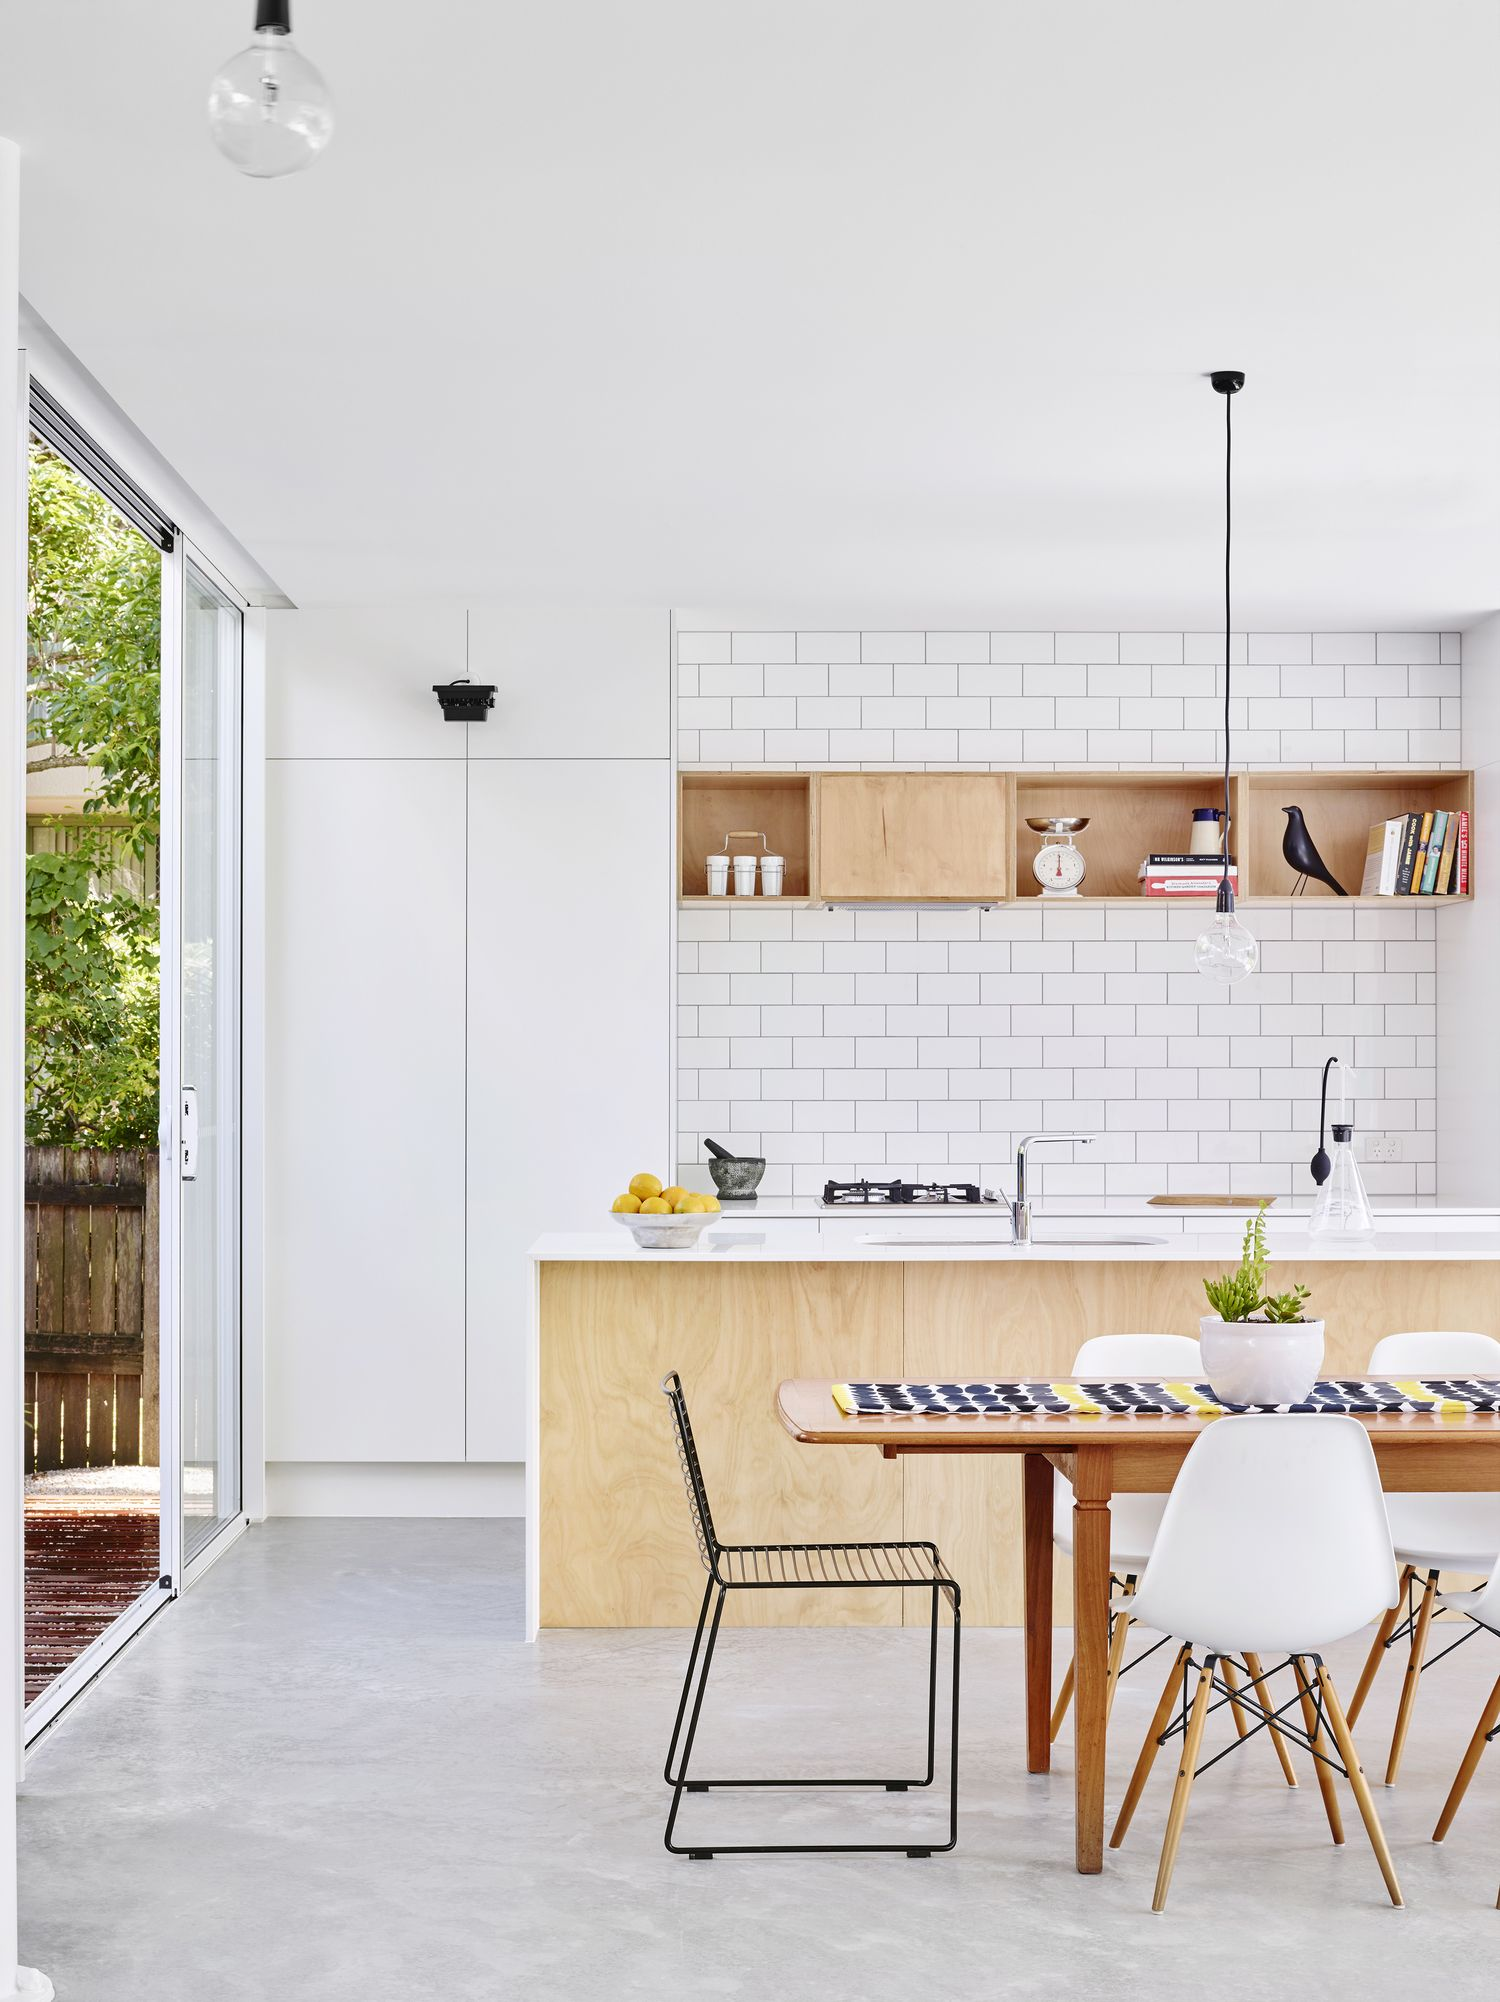 Yay or Nay: The Plywood Trend | Pinterest | Küche, Innenarchitektur ...